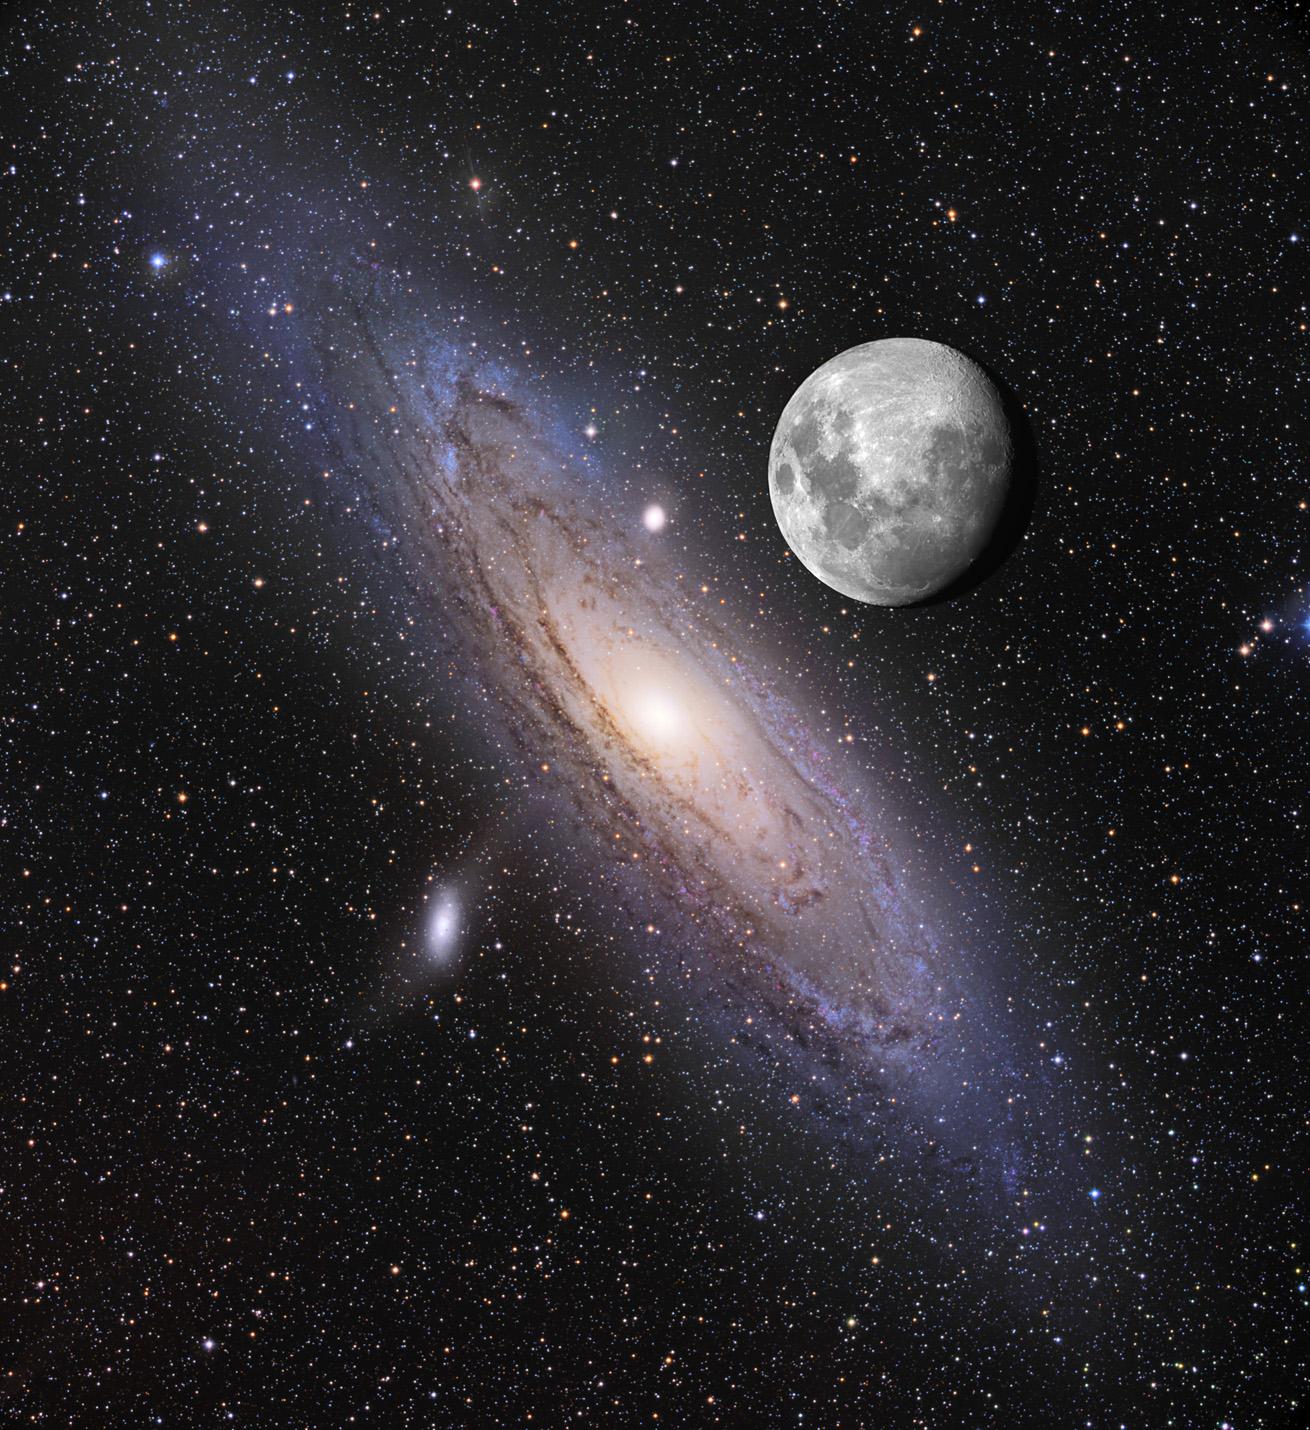 milky way compared to andromeda galaxy - photo #38